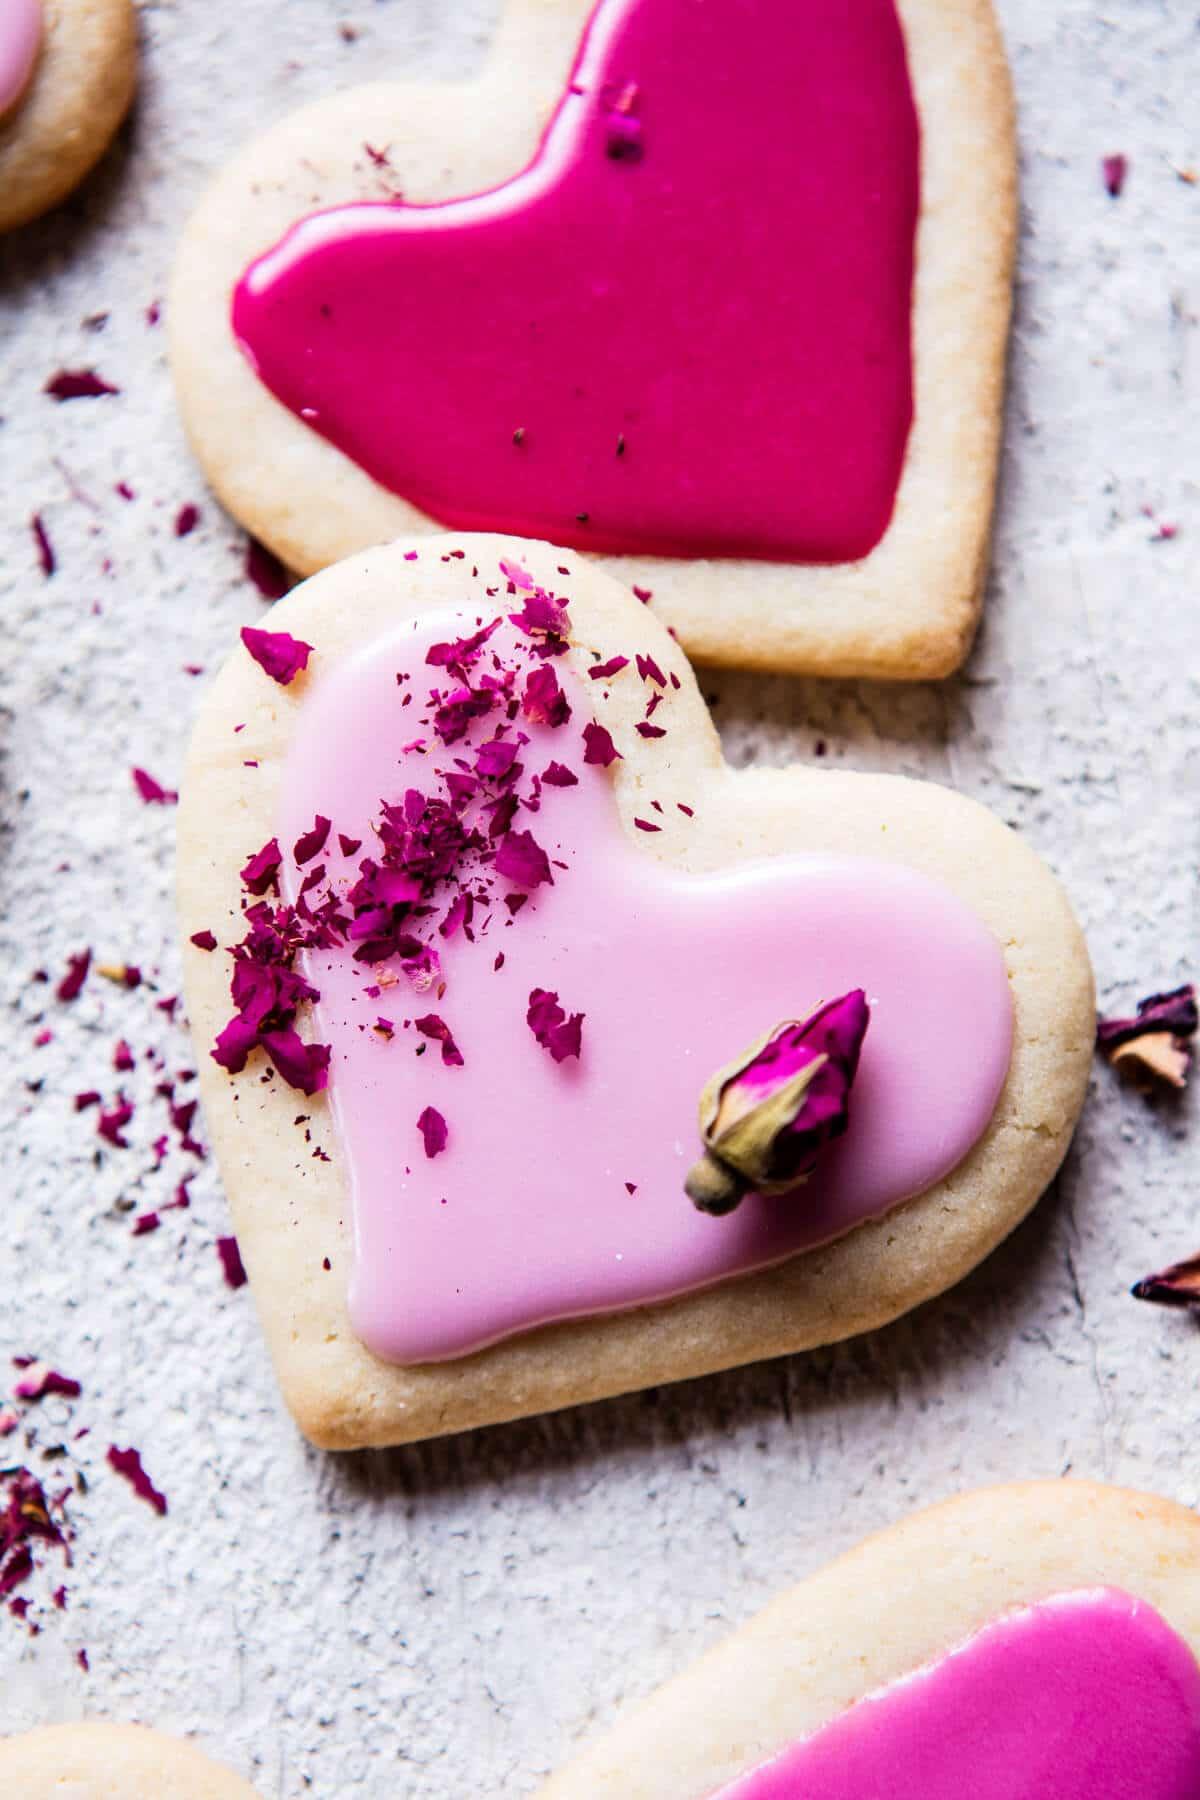 Soft-and-Fluffy-Cream-Cheese-Sugar-Cookies-8.jpg